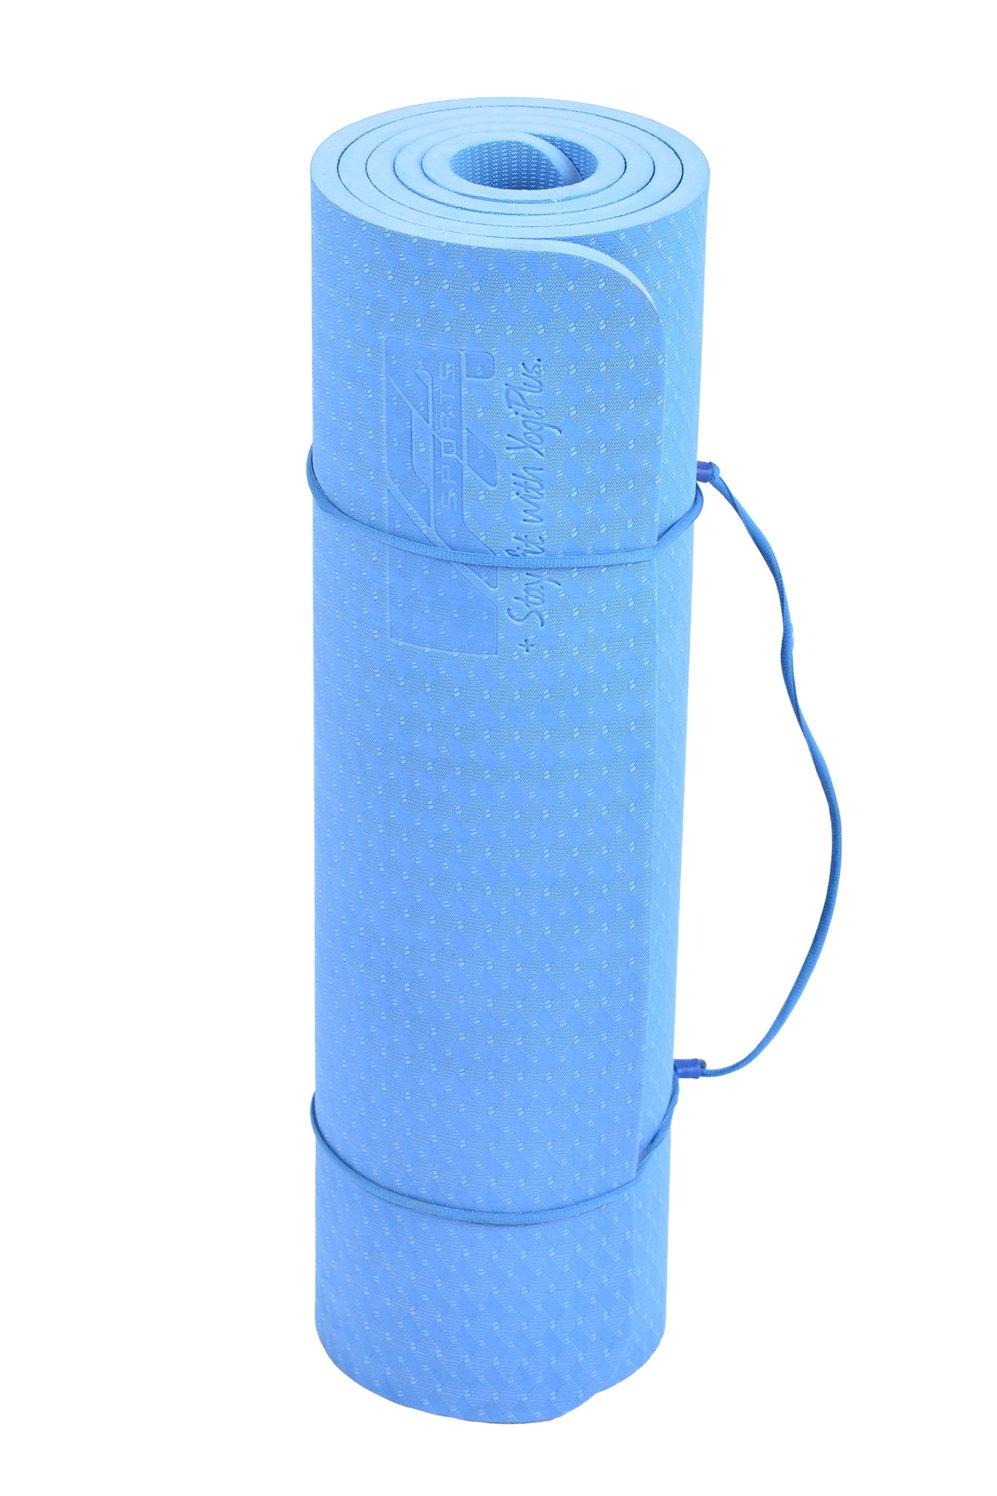 FA Sports Yogamatte Yogiplus Unilayer 183 x 61 x 1.2 cm